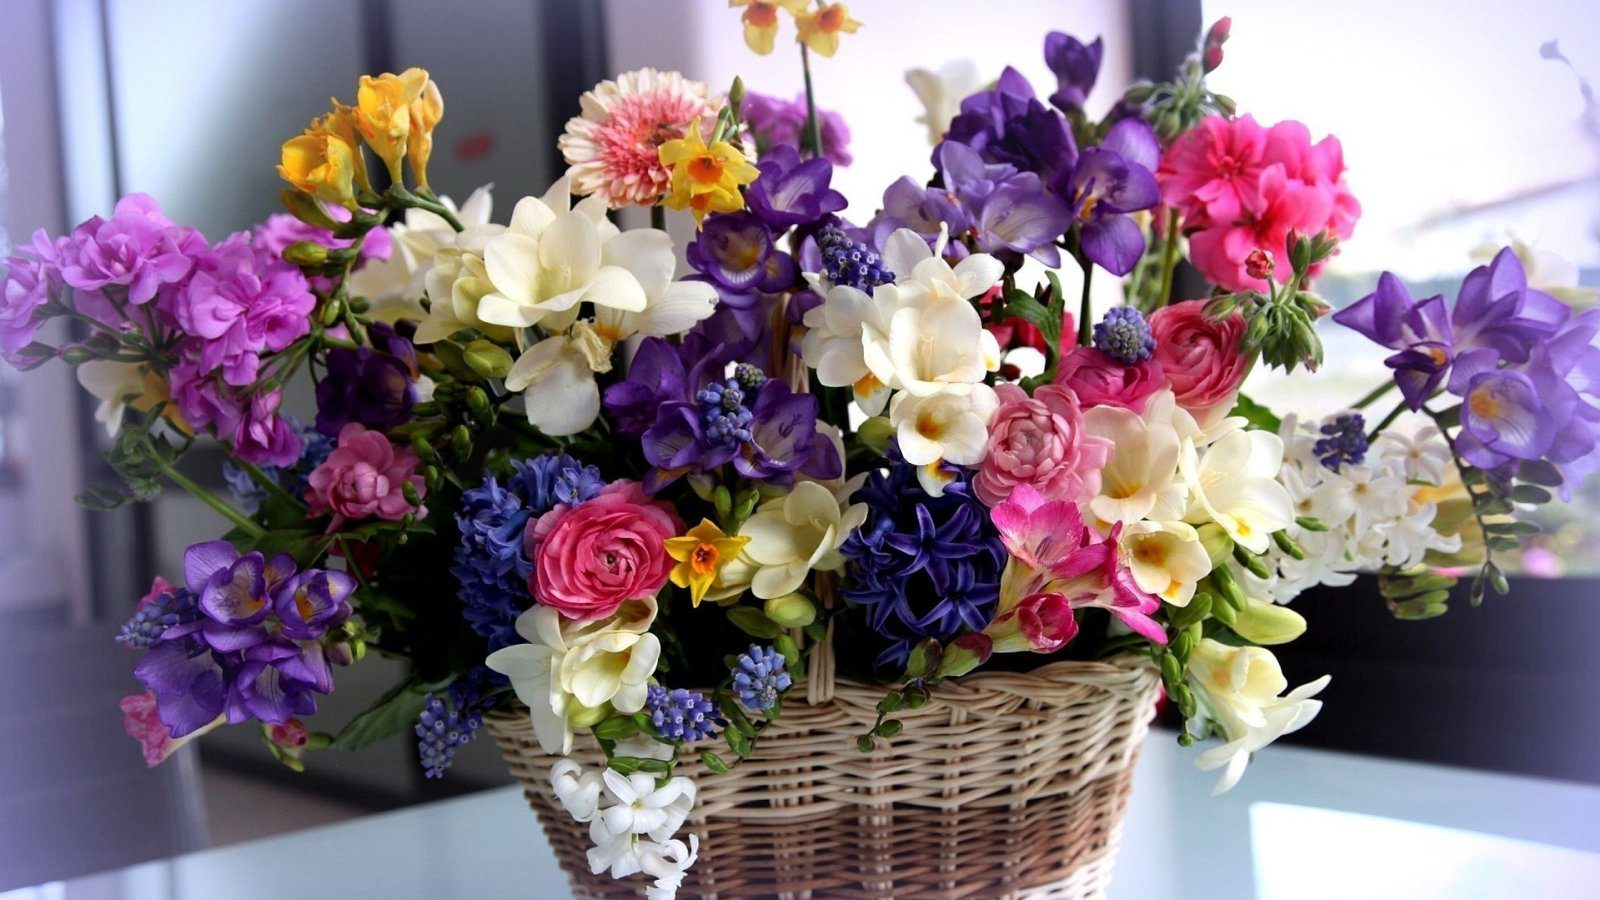 http://bipbap.ru/wp-content/uploads/2017/04/flowers_01.jpg